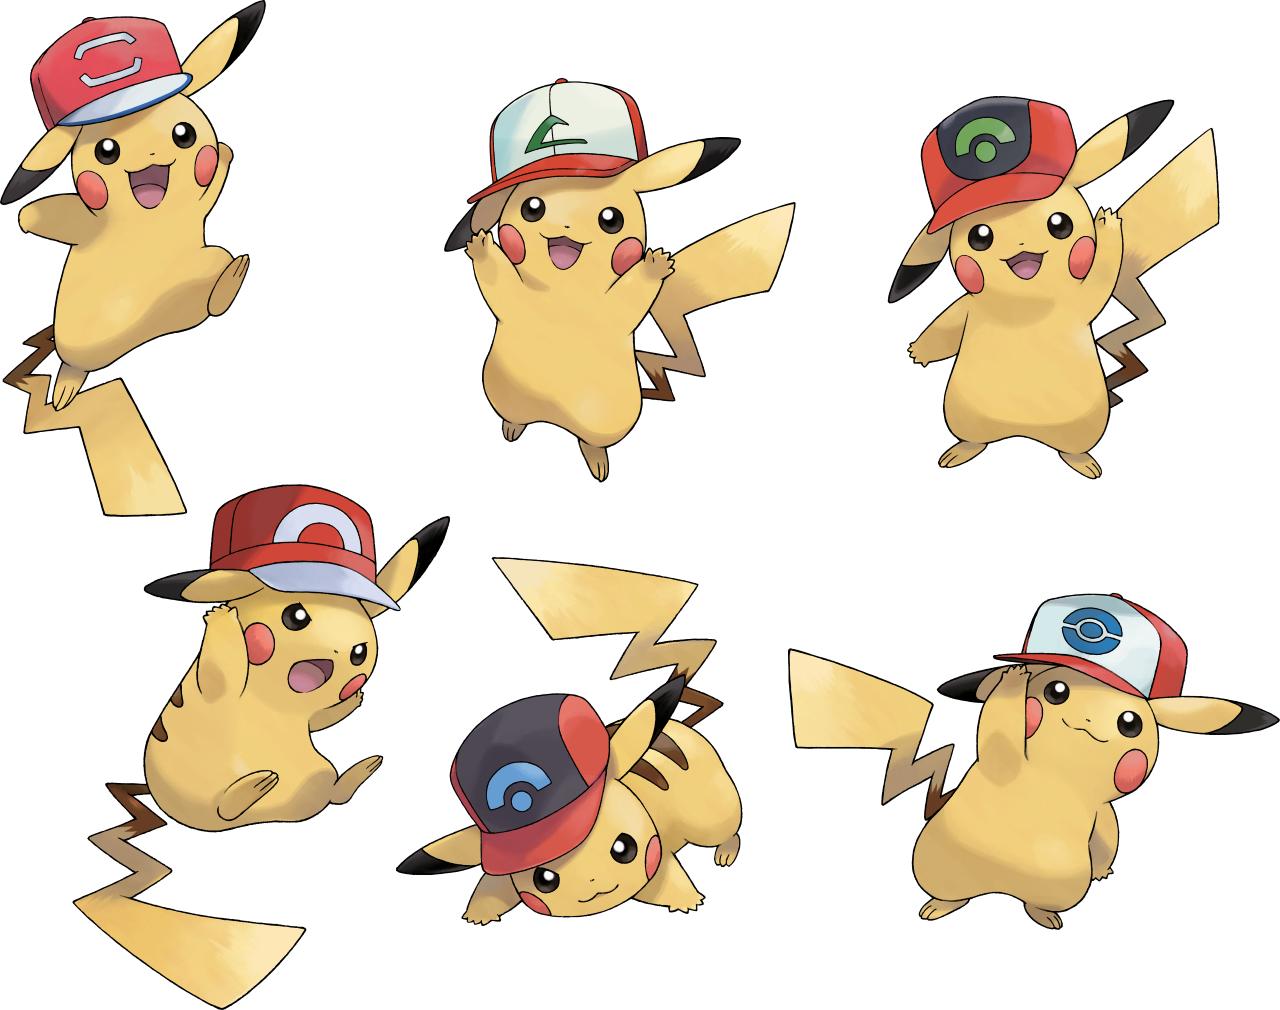 Pokemon Detective Pikachu Full Movie Watch Online FREE Download